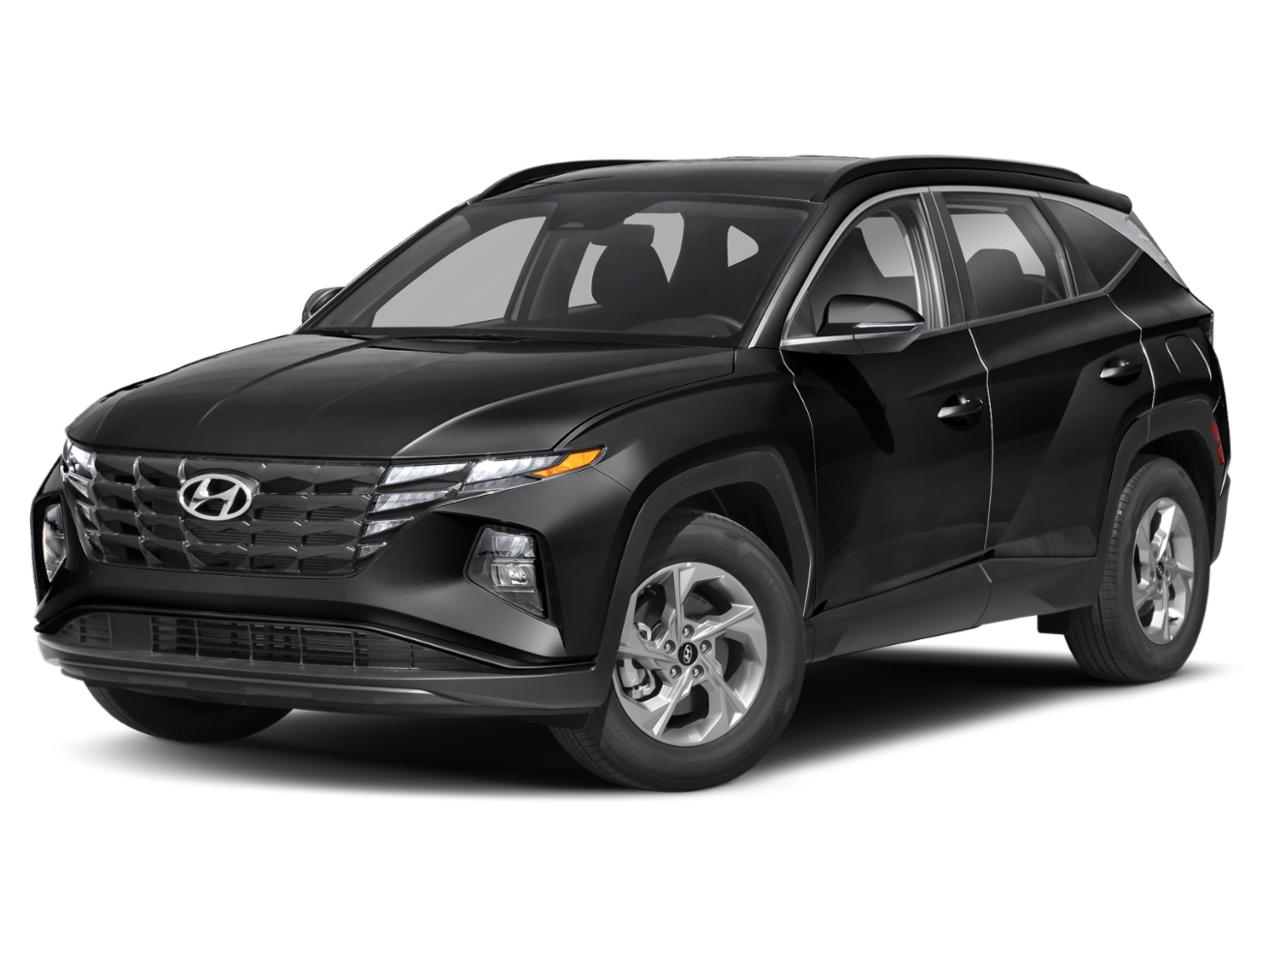 2022 Hyundai Tucson Vehicle Photo in Peoria, IL 61615